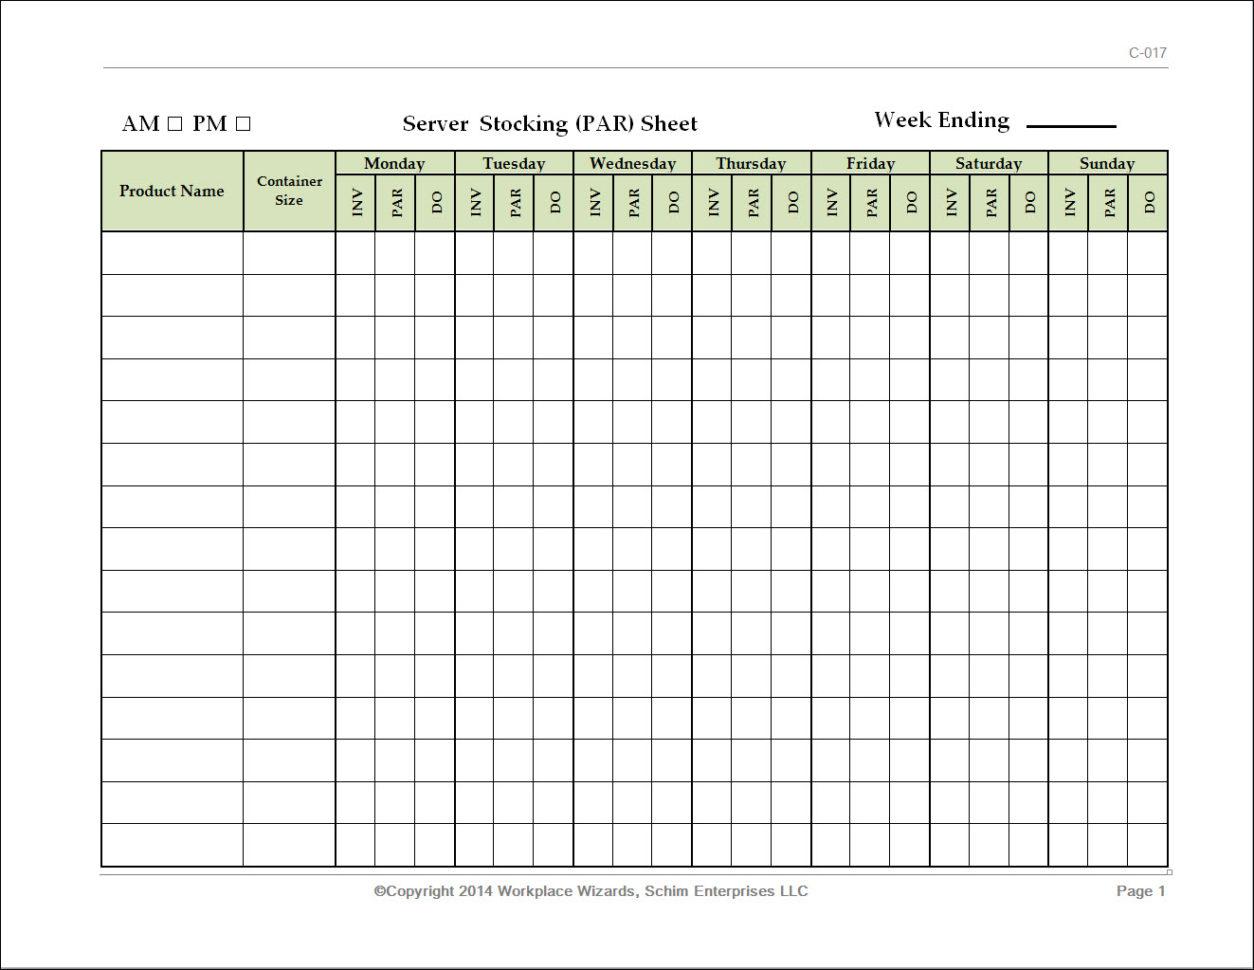 Restaurant Startup Spreadsheets Throughout Free Restaurant Startup Costs Spreadsheet  Homebiz4U2Profit